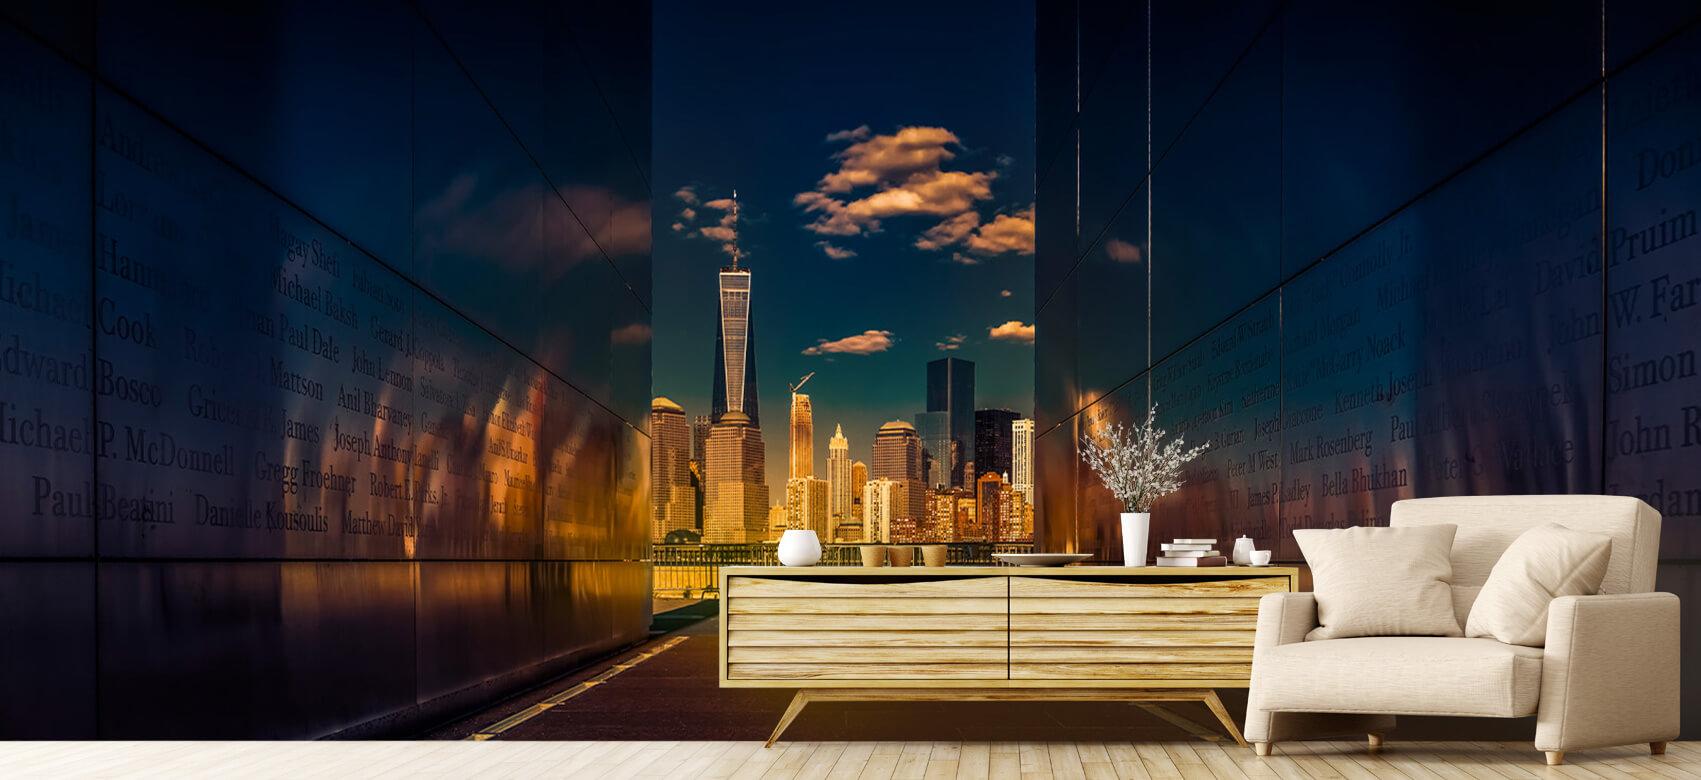 Architecture City freedom 2